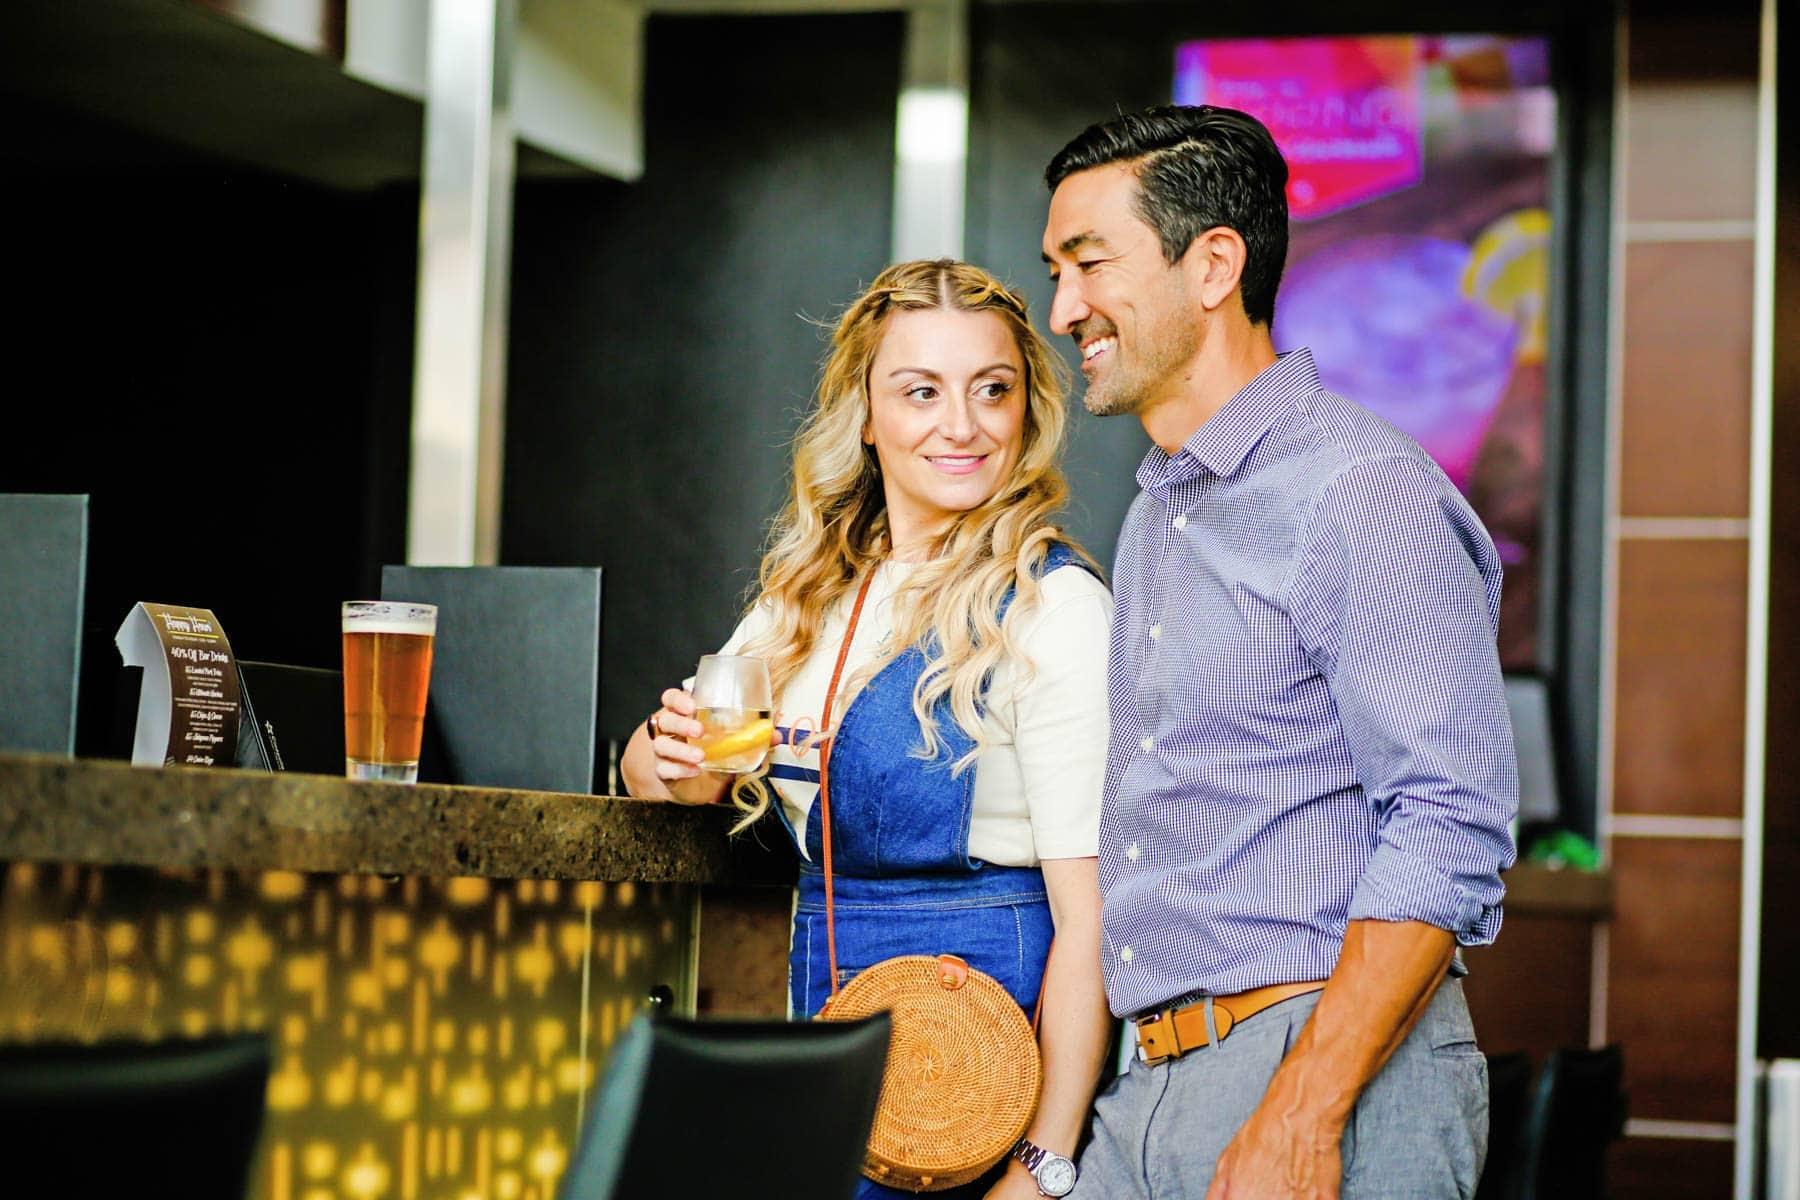 Couple Enjoying the Happy Hour #movienight #cinepolis #familybonding #familylove